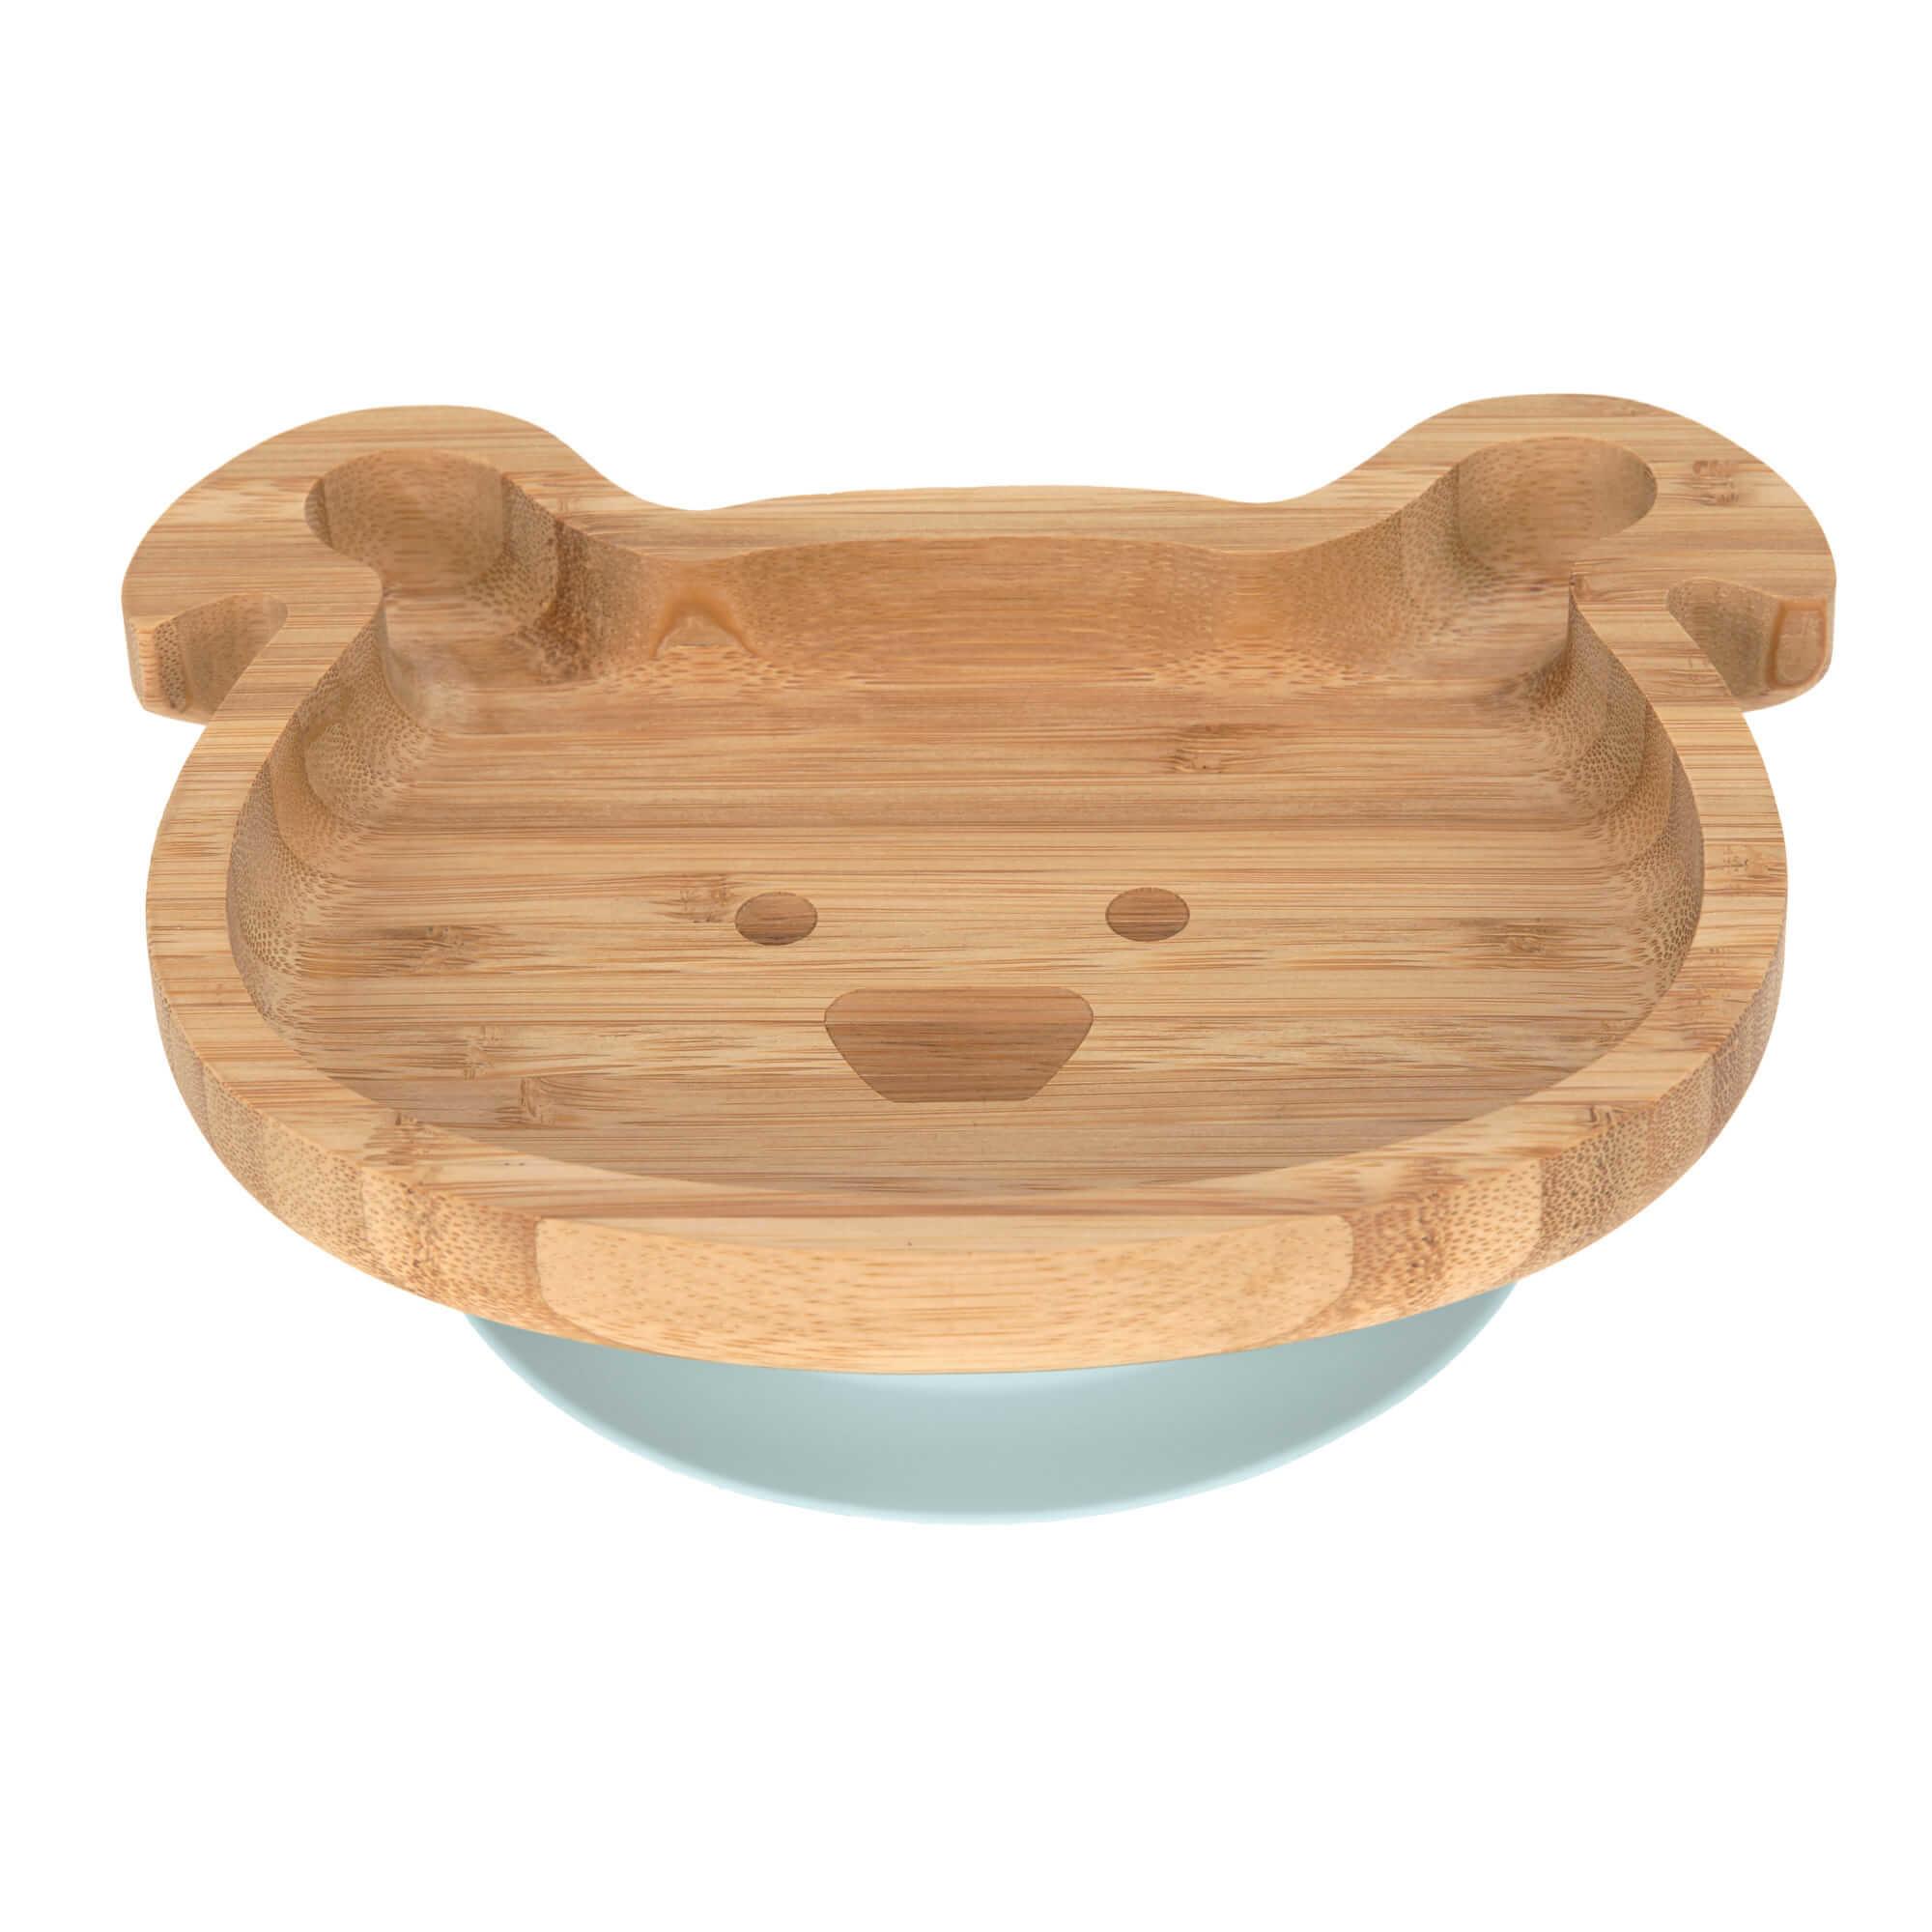 Lässig Lässig 4Babies & Kids Bord bamboo/hout met zuignap silicone little chums dog